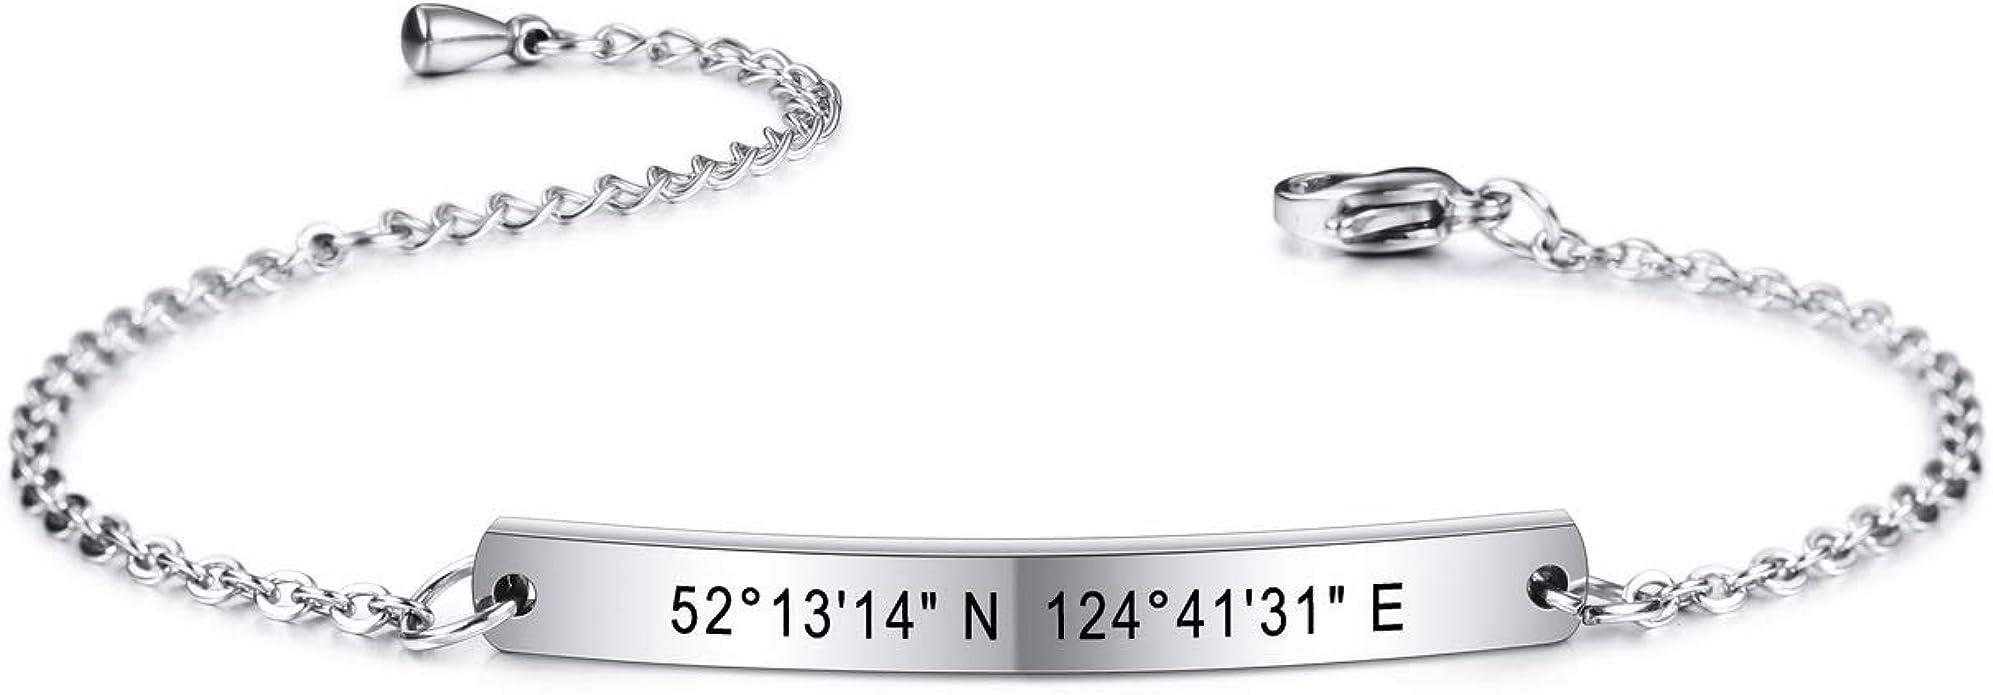 Dainty Personalized Bracelet Name Bracelet Custom Engraved Any Name or Text